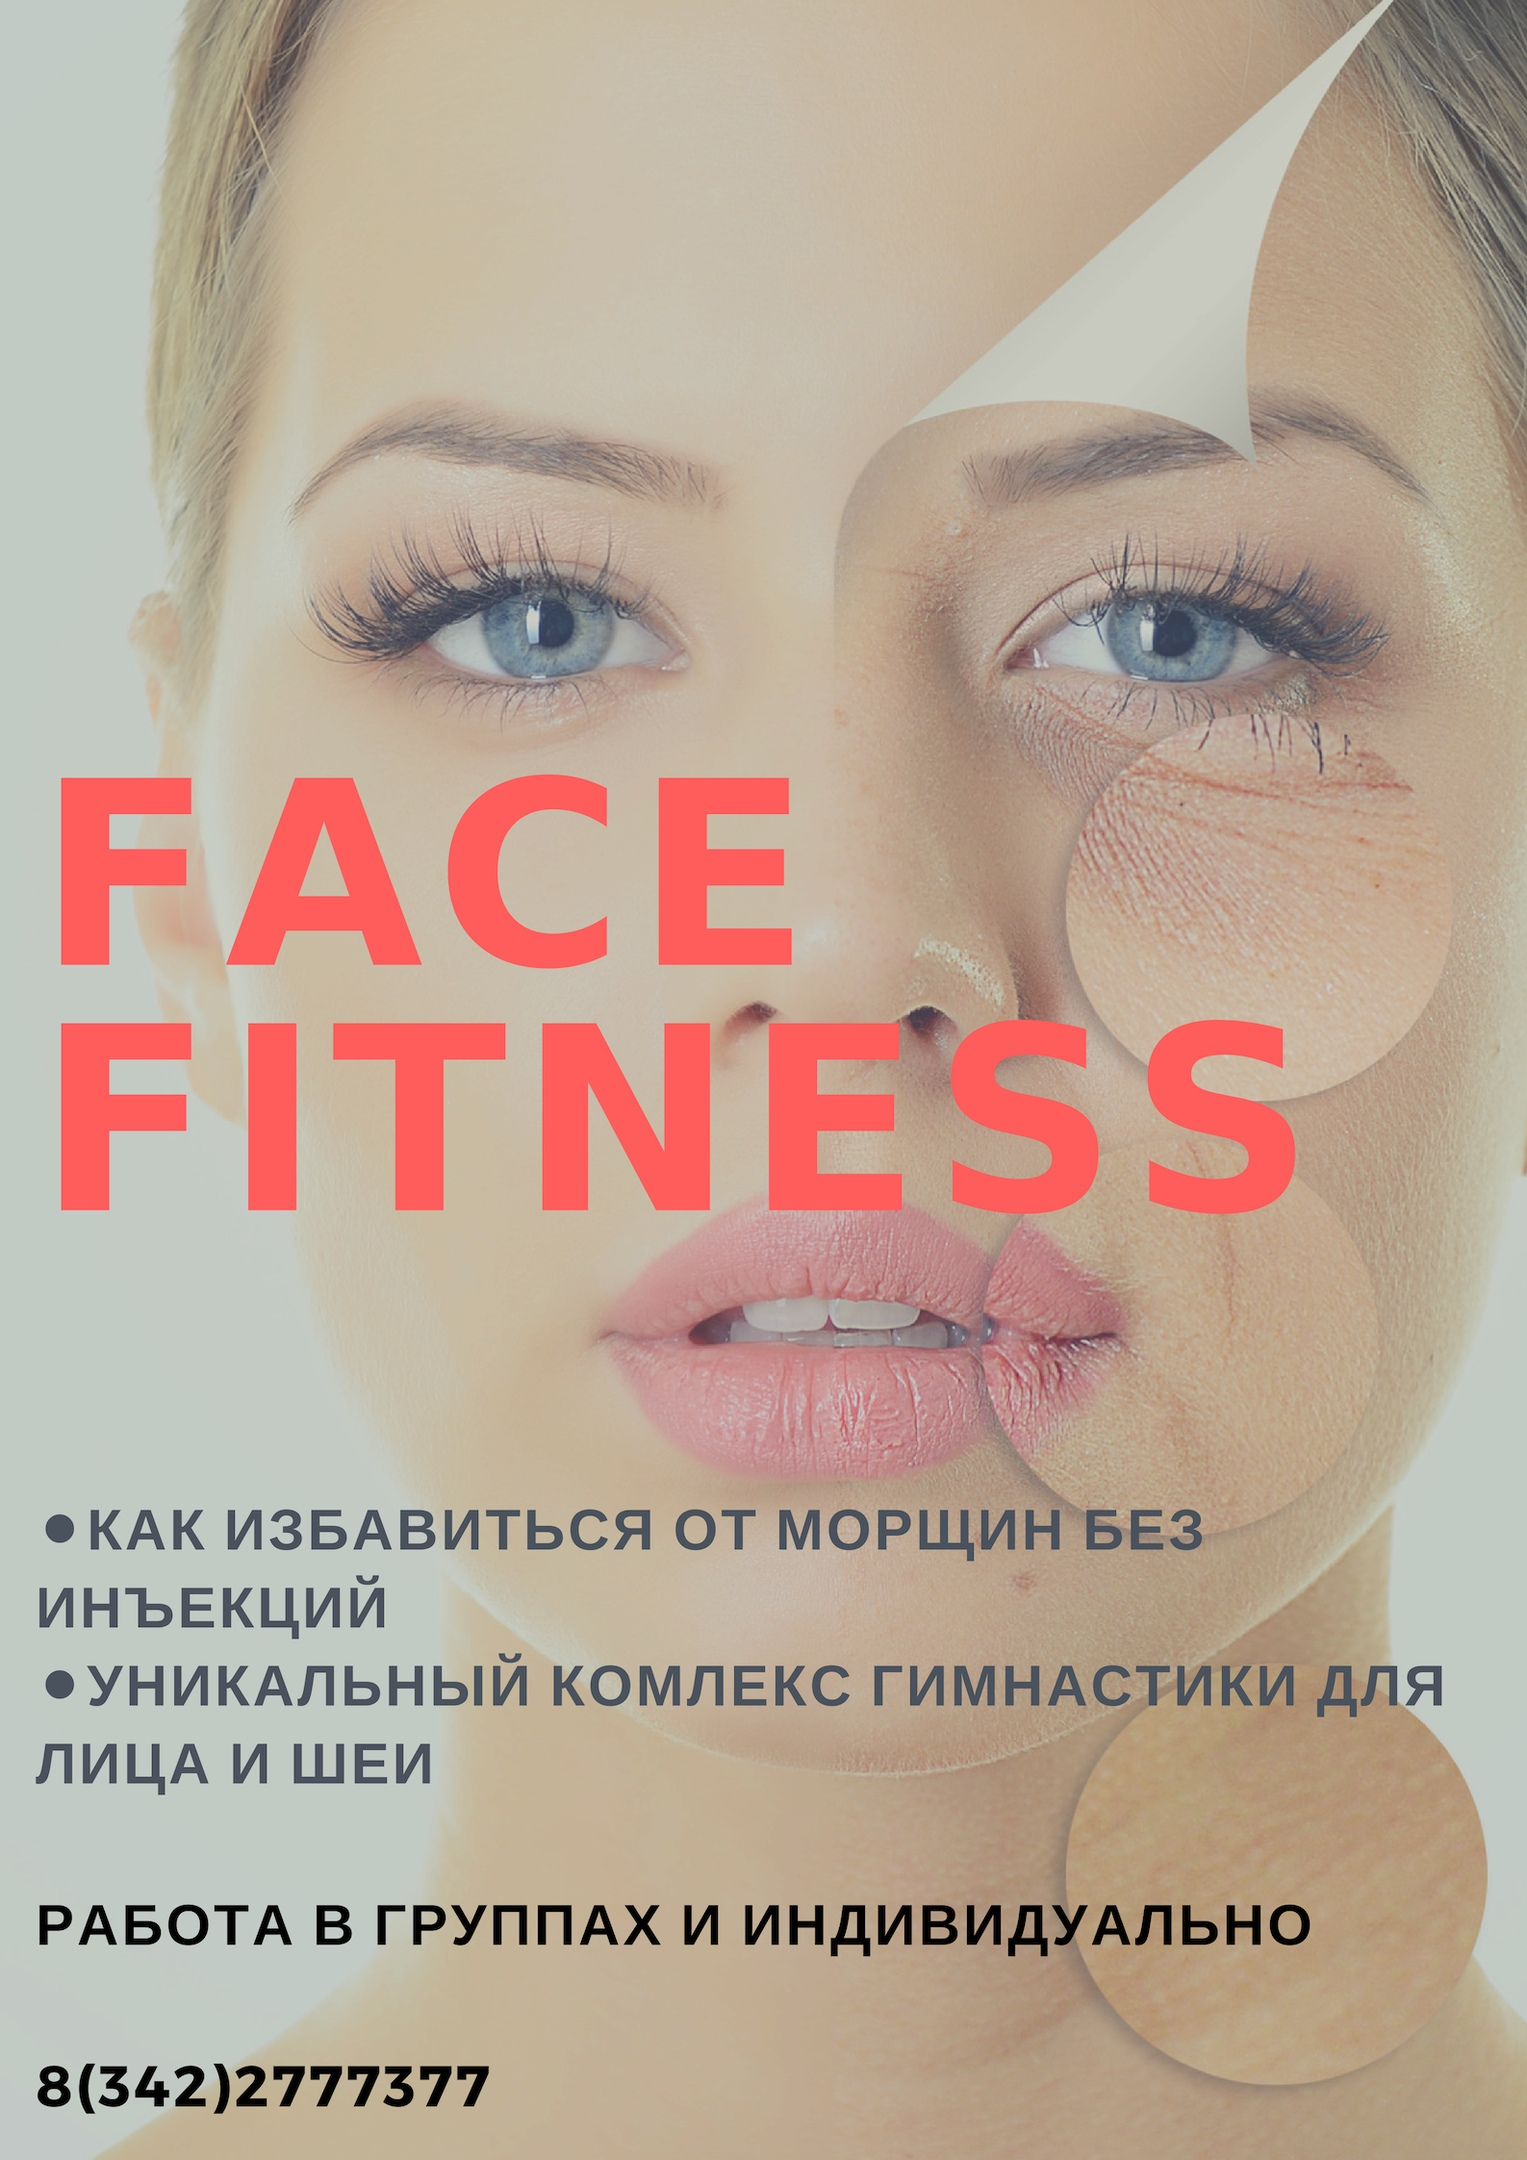 Фитнес для лица